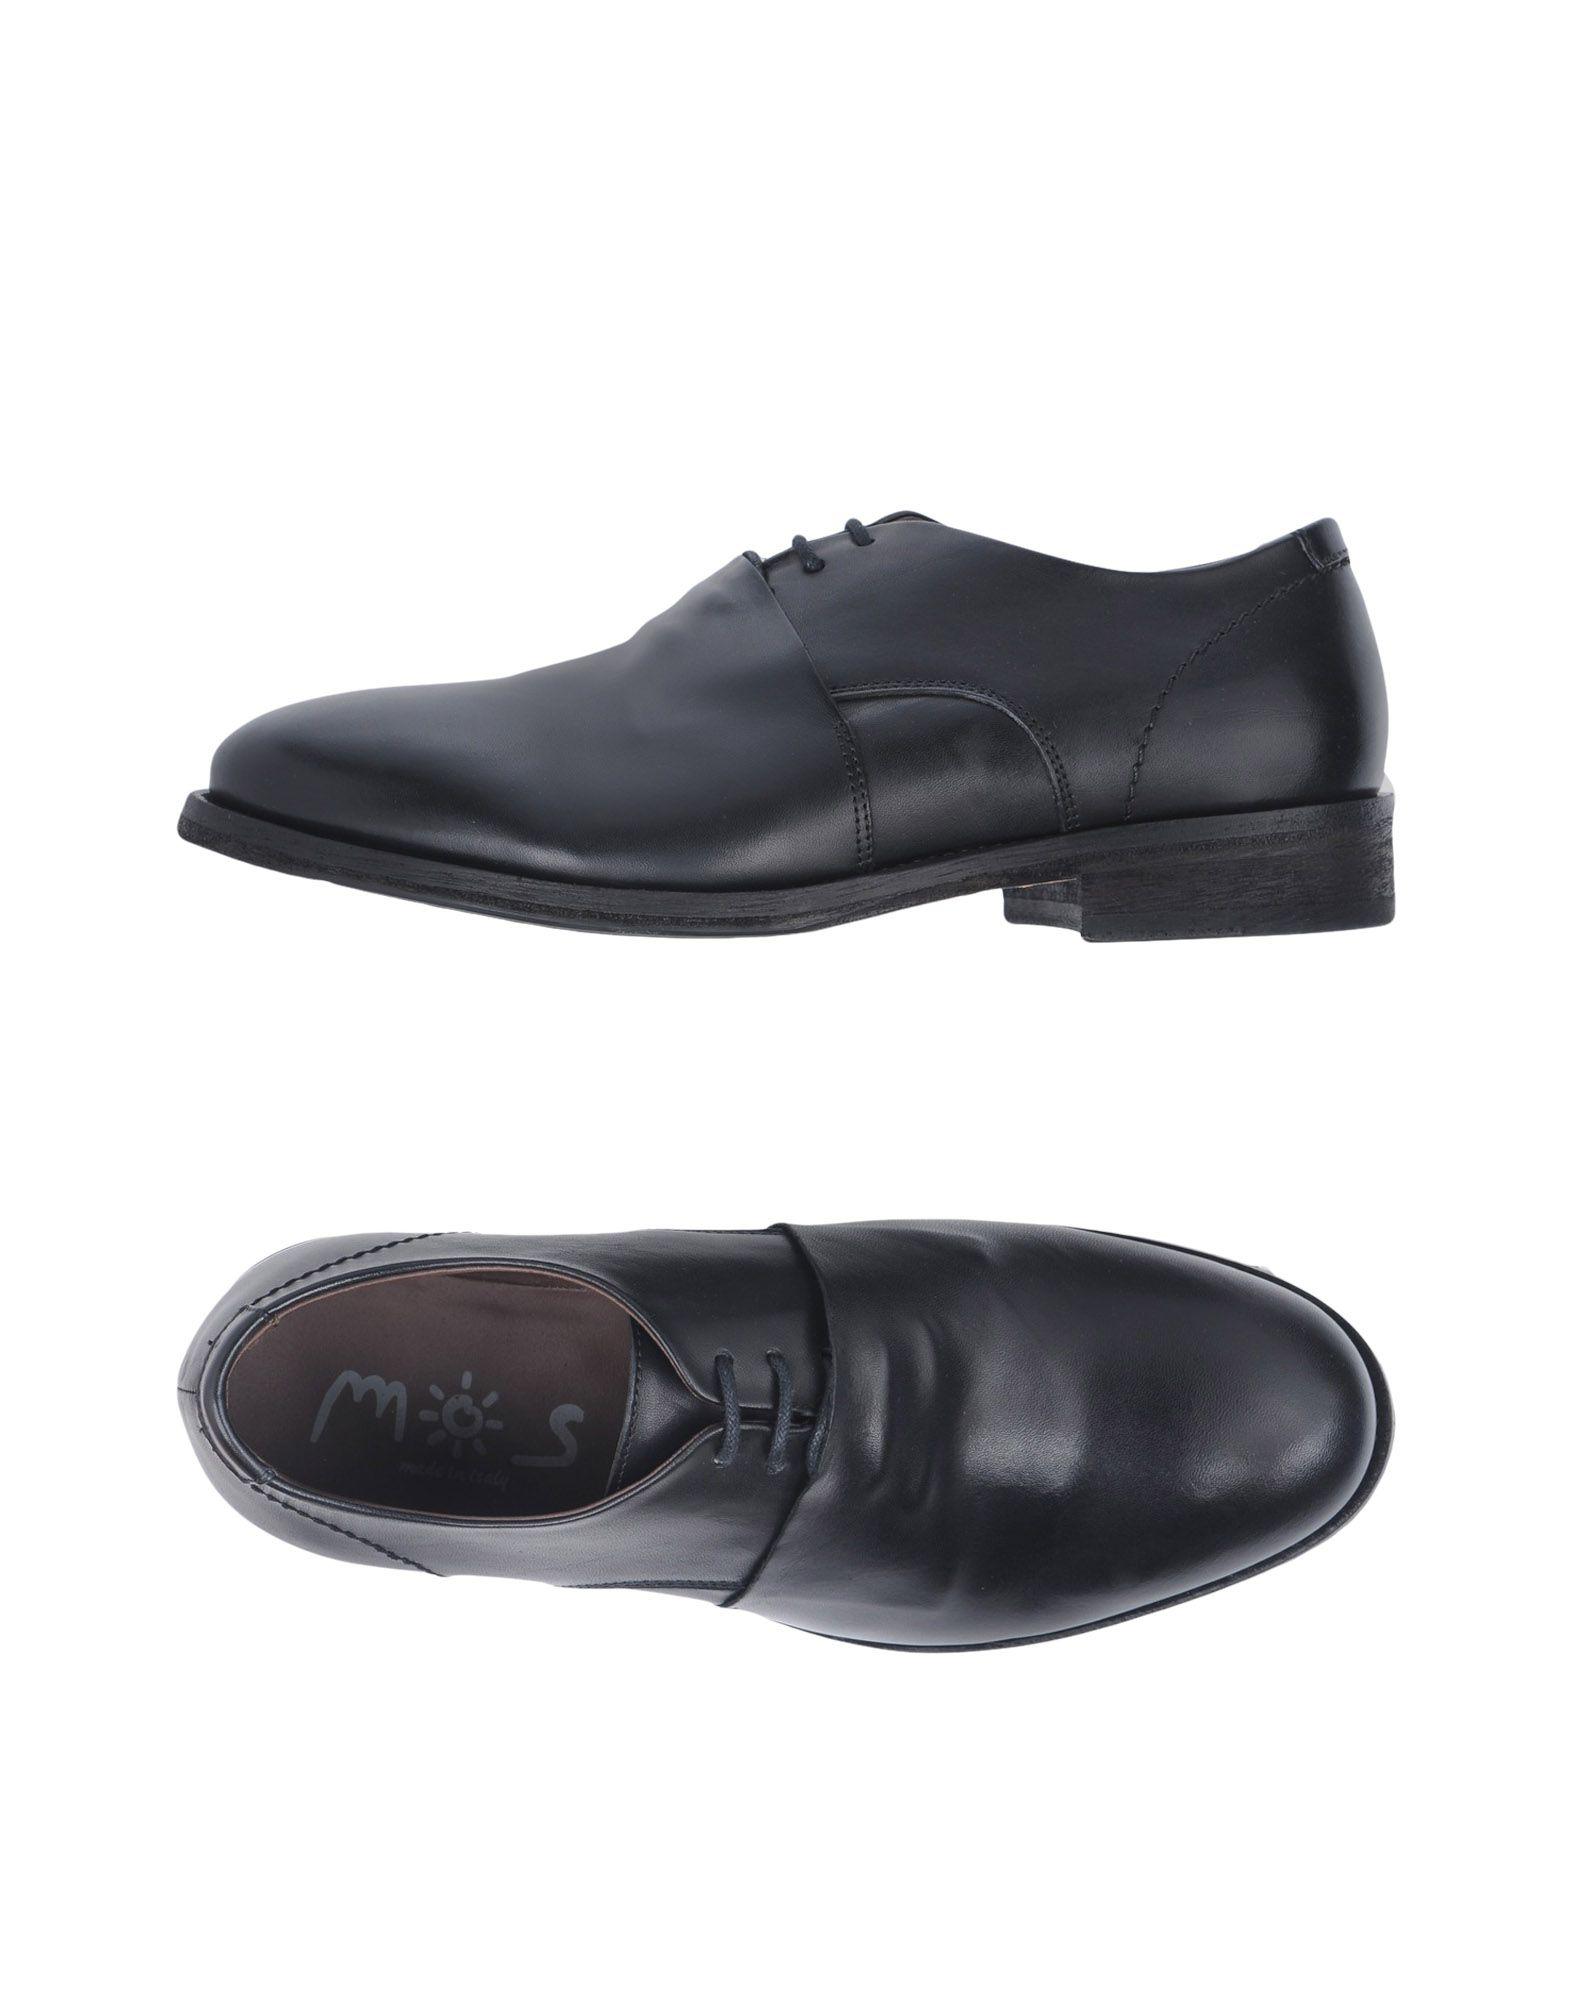 Rabatt echte Schuhe Mos Schnürschuhe Herren  11350973UN